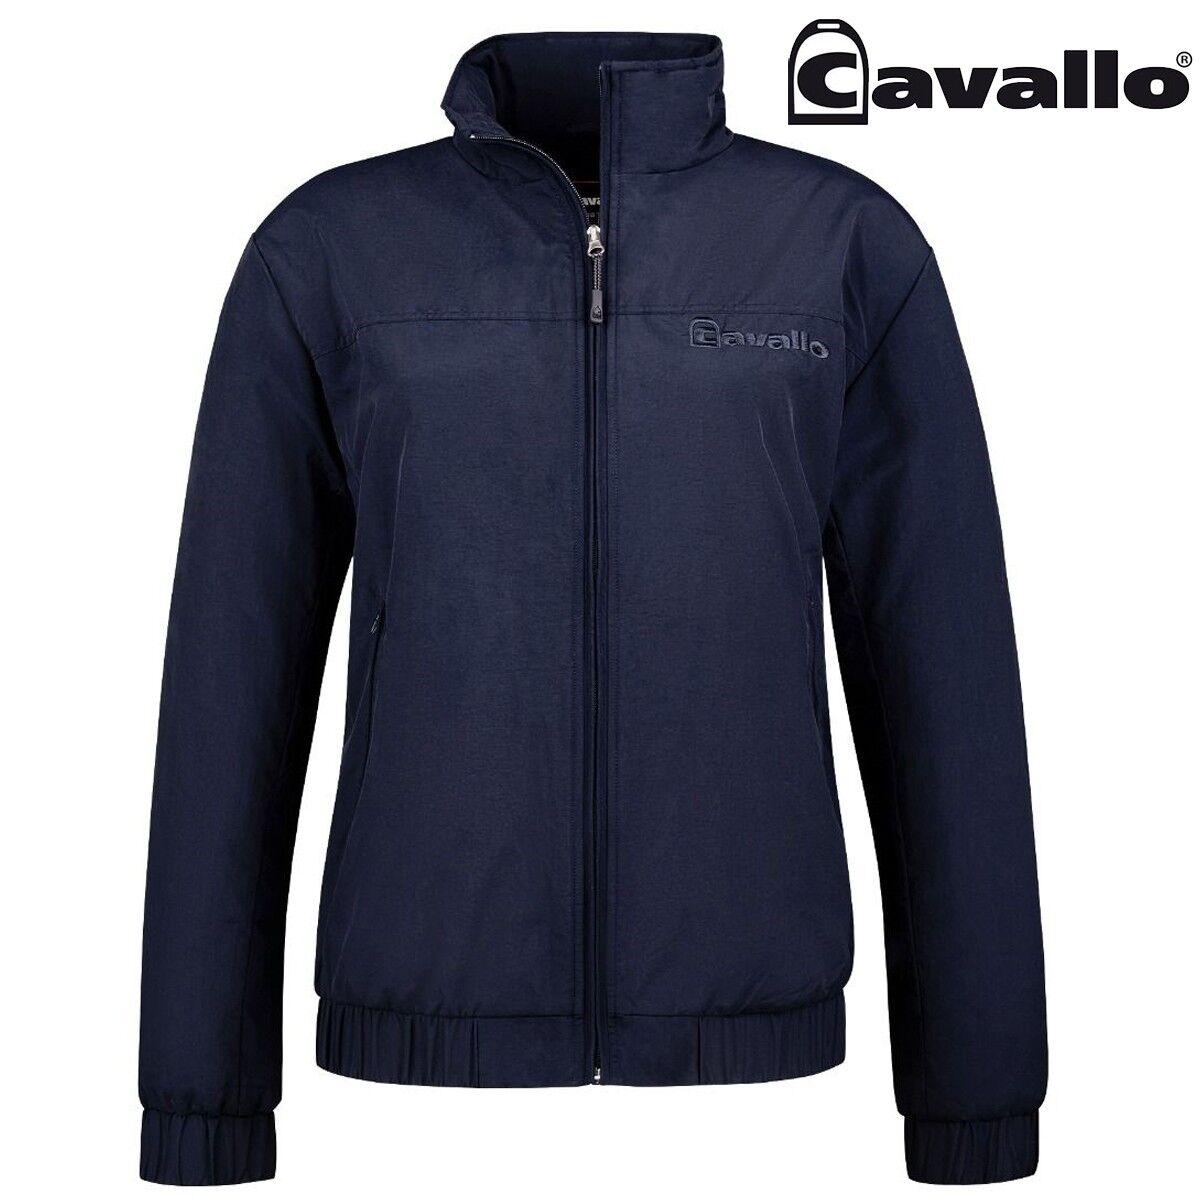 Cavallo Inger Team Blouson - Free UK Shipping